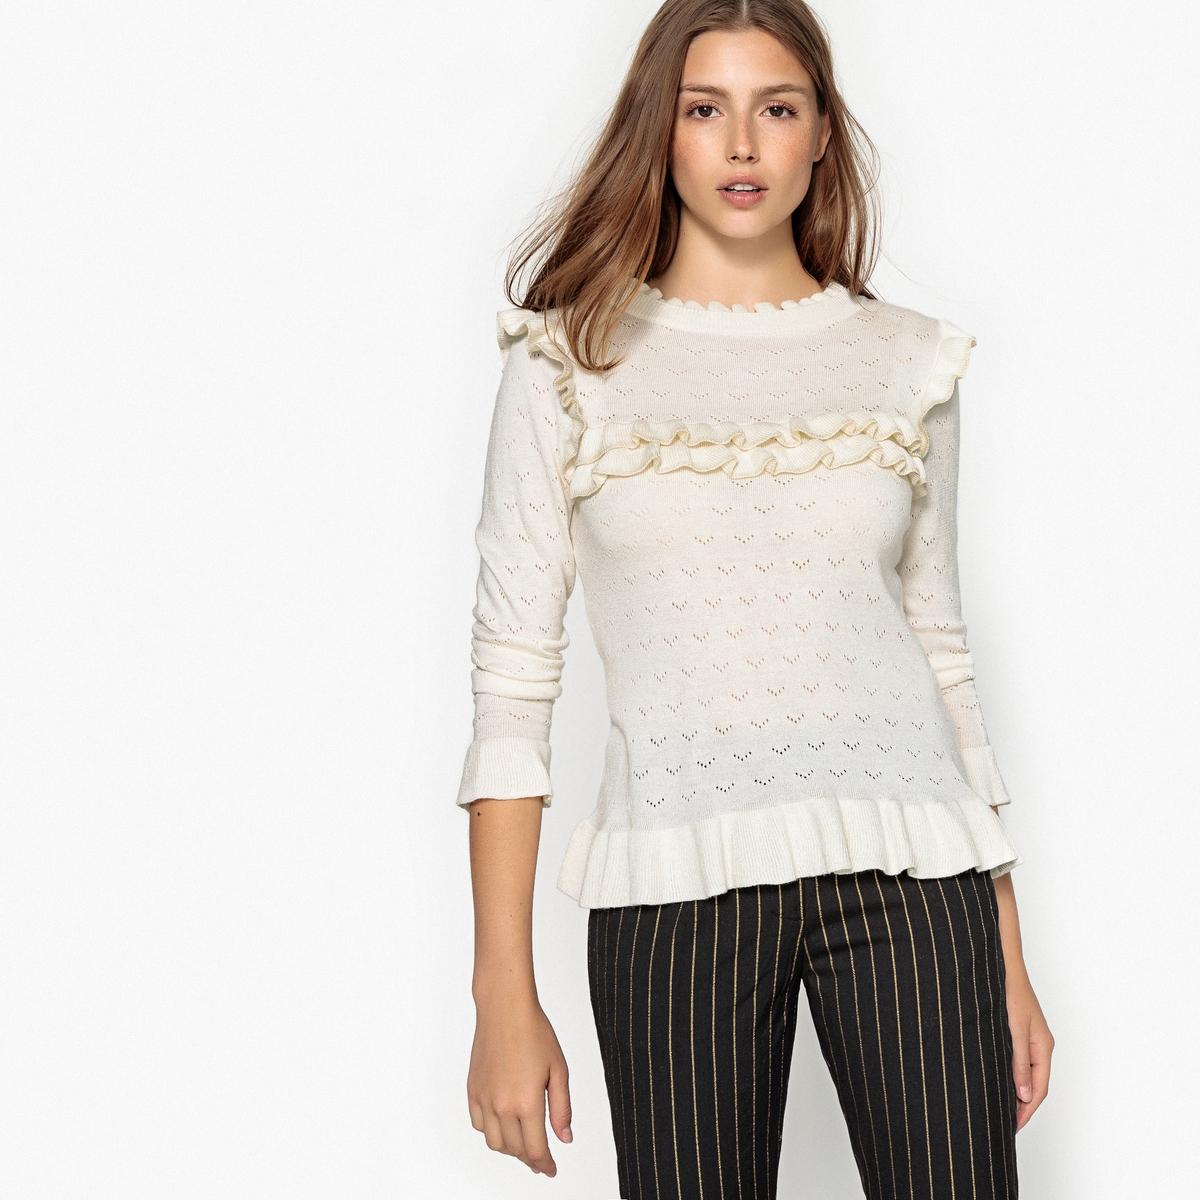 Пуловер с круглым вырезом и воланами PRUNE шапка носок apo stripes prune multicolor